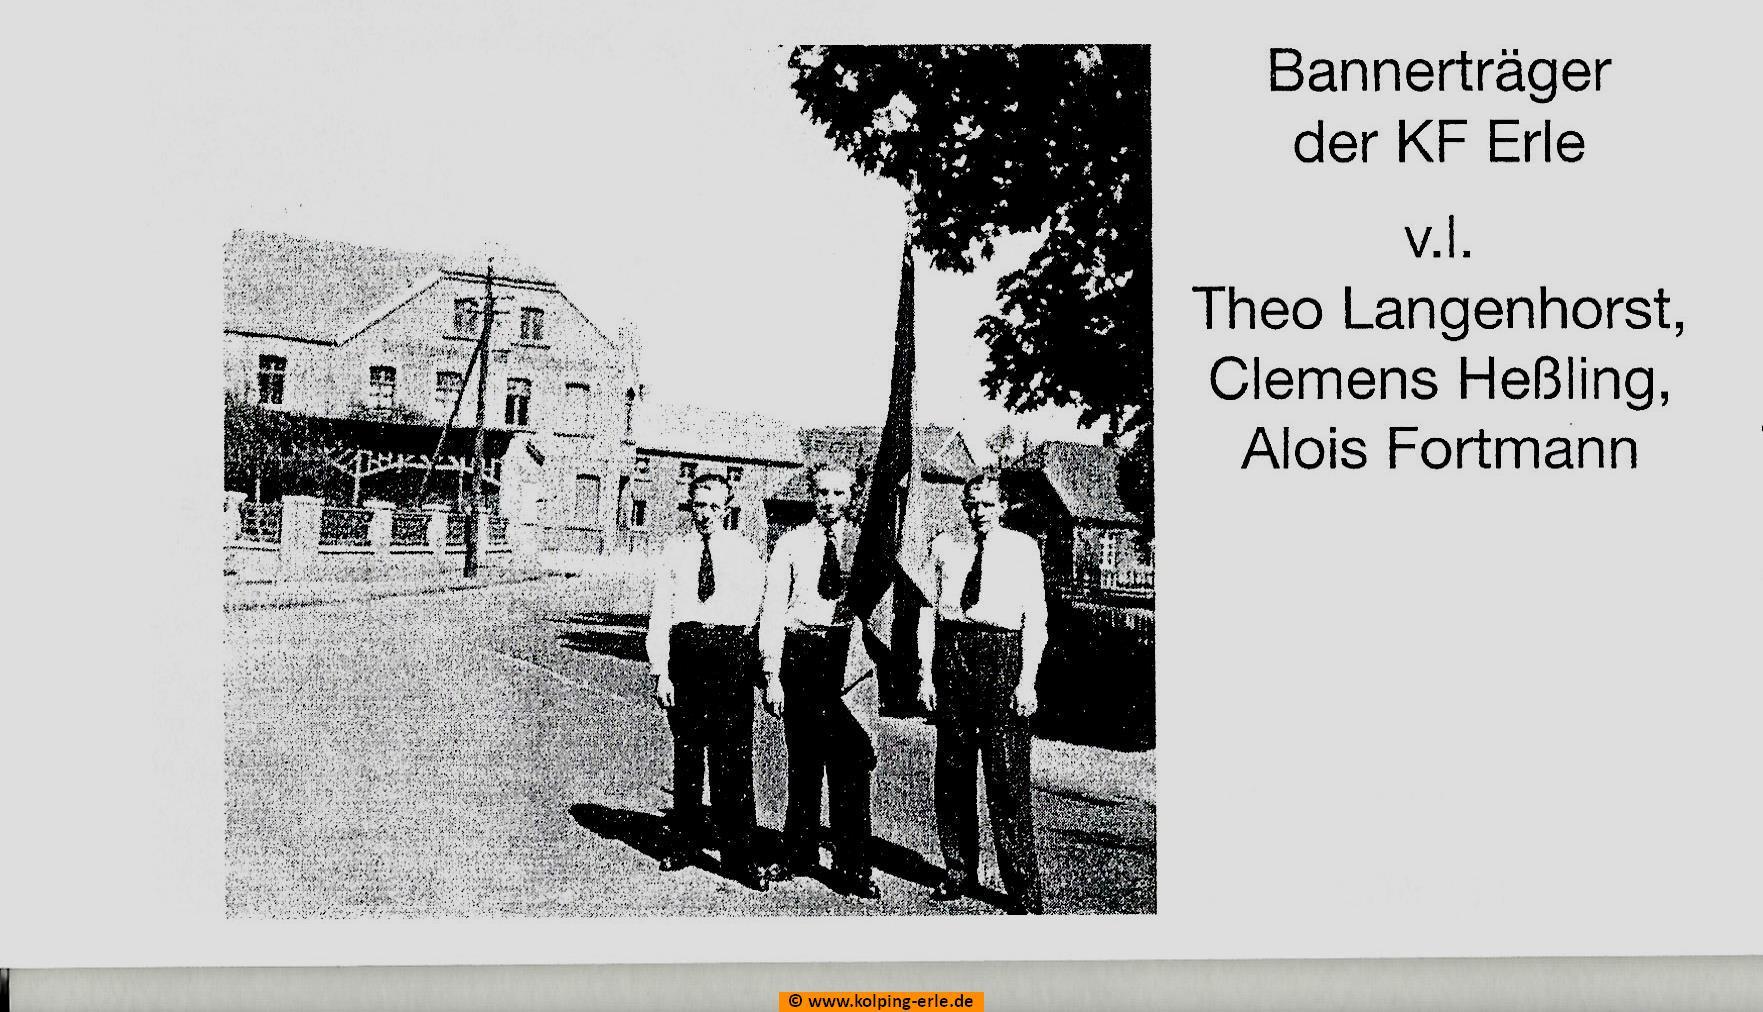 Bannerträger der Kolpingsfamilie-Erle